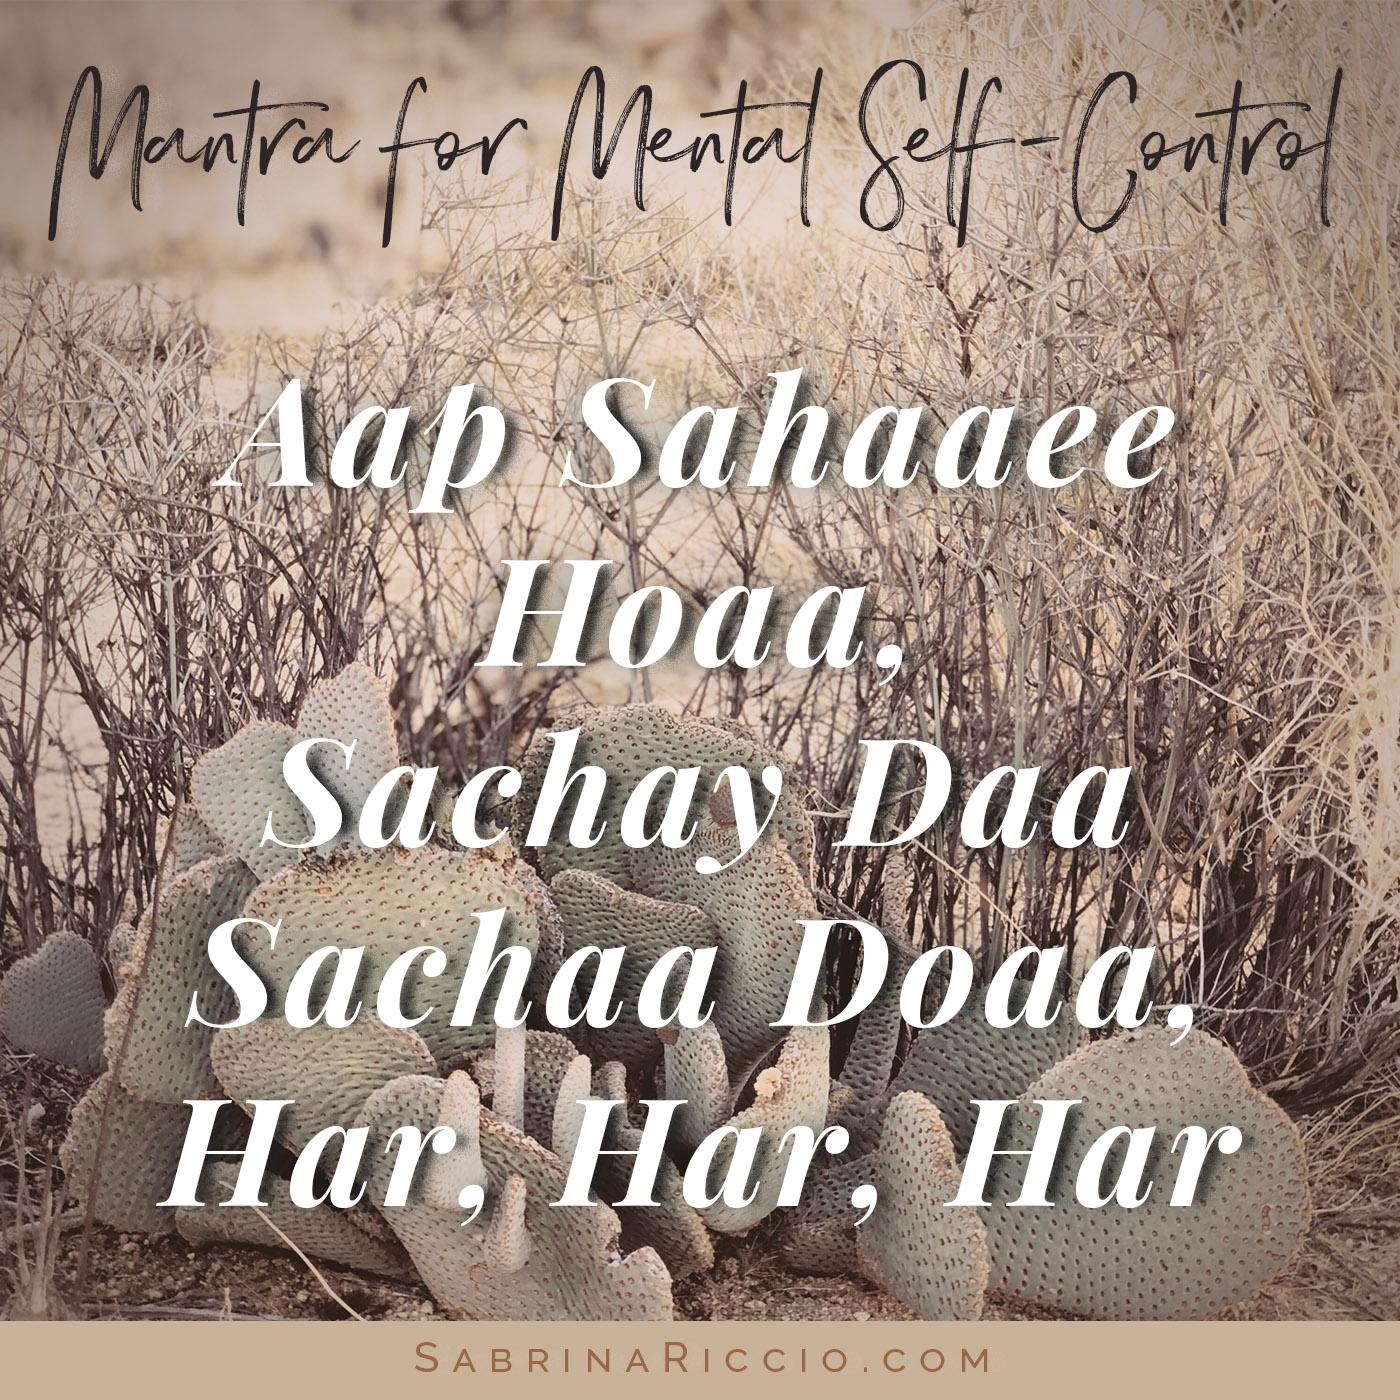 Aap Sahaaee Hoaa   Mantra for Mental Self-Control   SabrinaRiccio.com